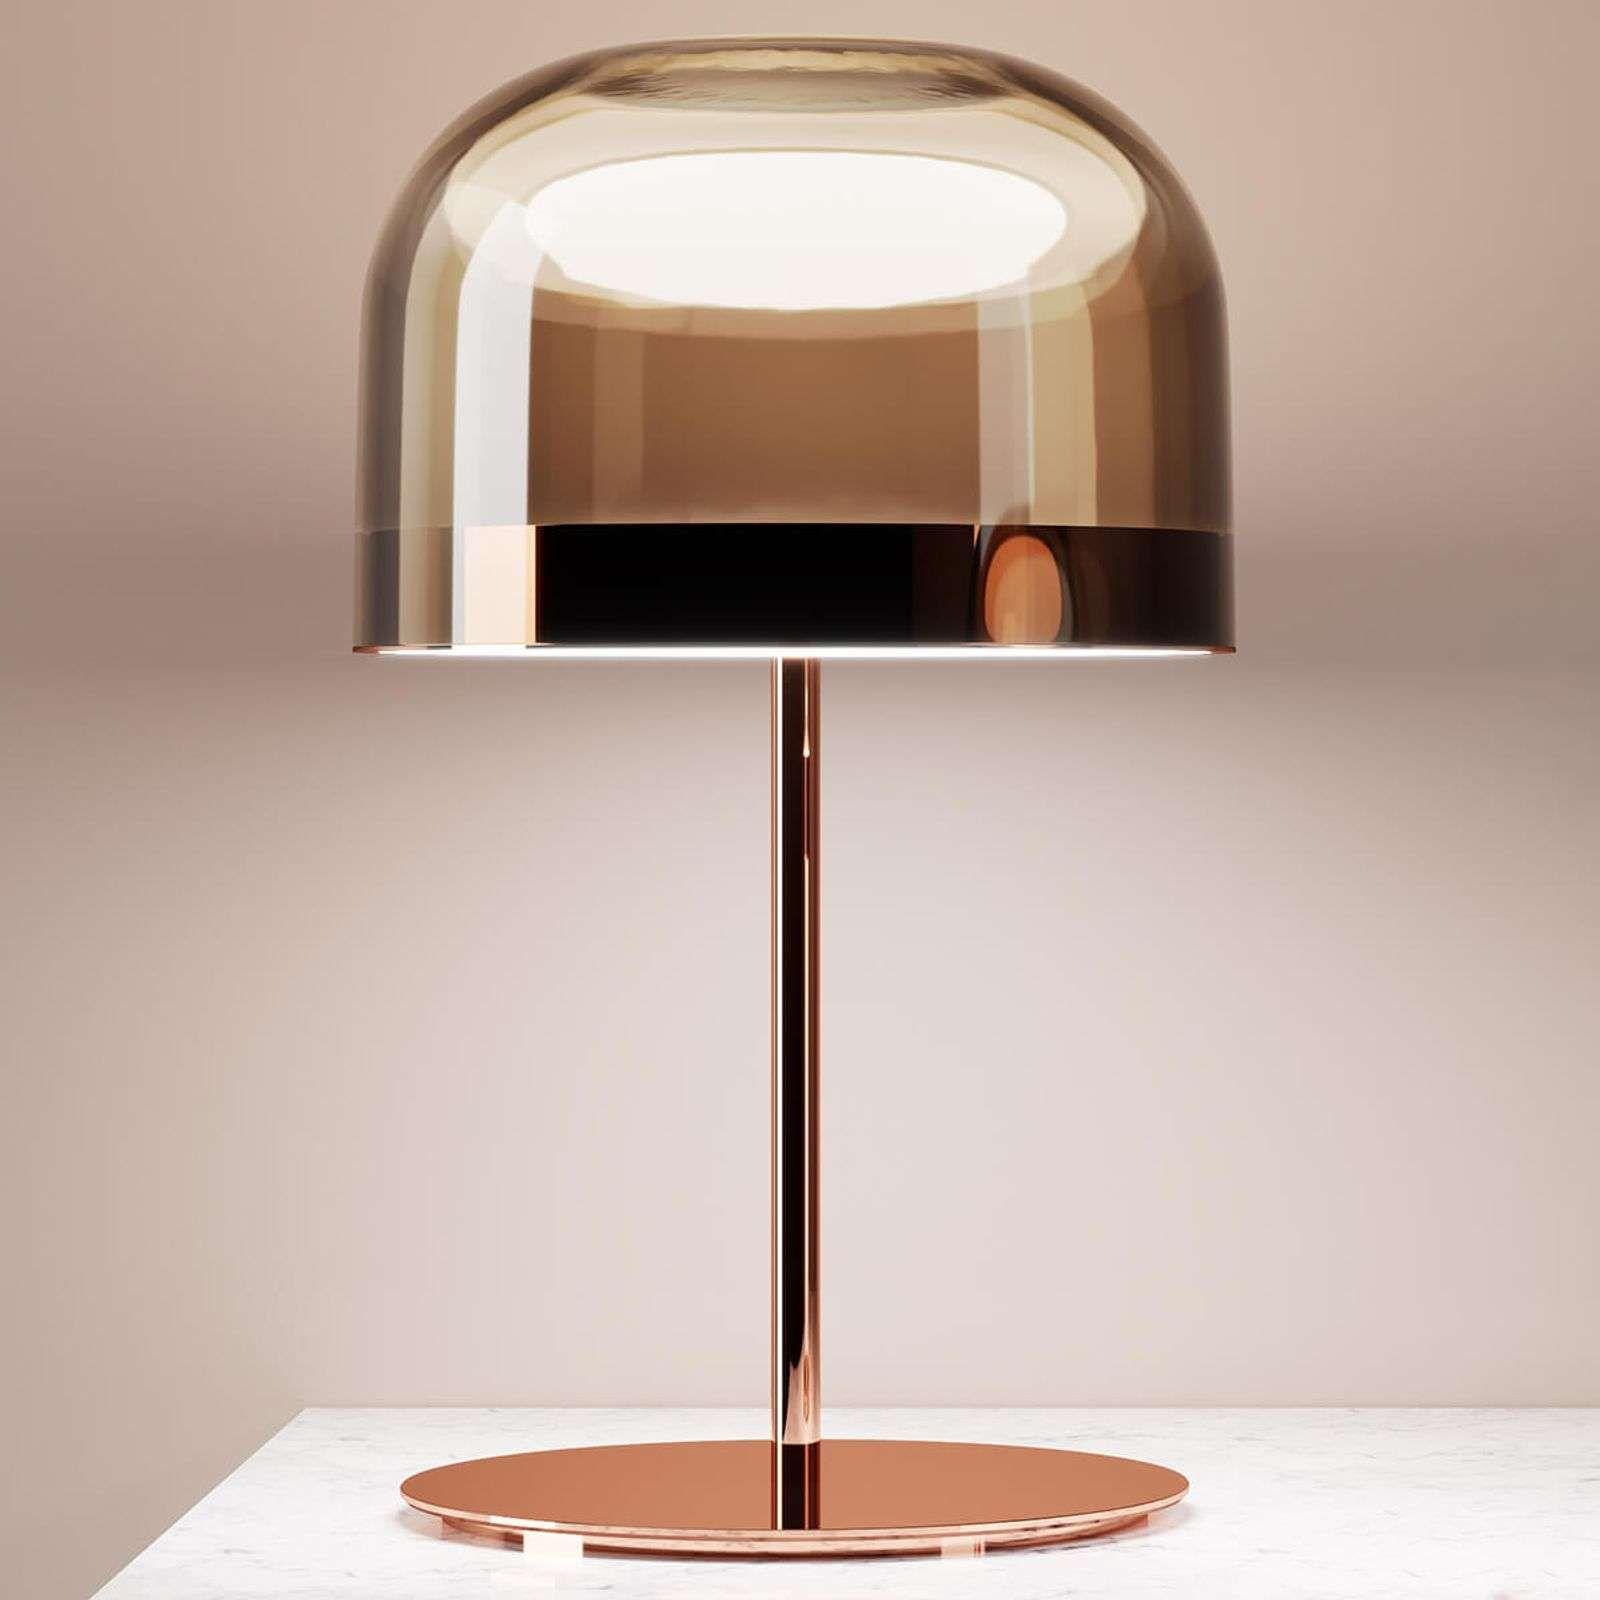 Lampe A Poser Led Equatore En Cuivre 60 Cm In 2020 Copper Table Lamp Lamp Copper Table